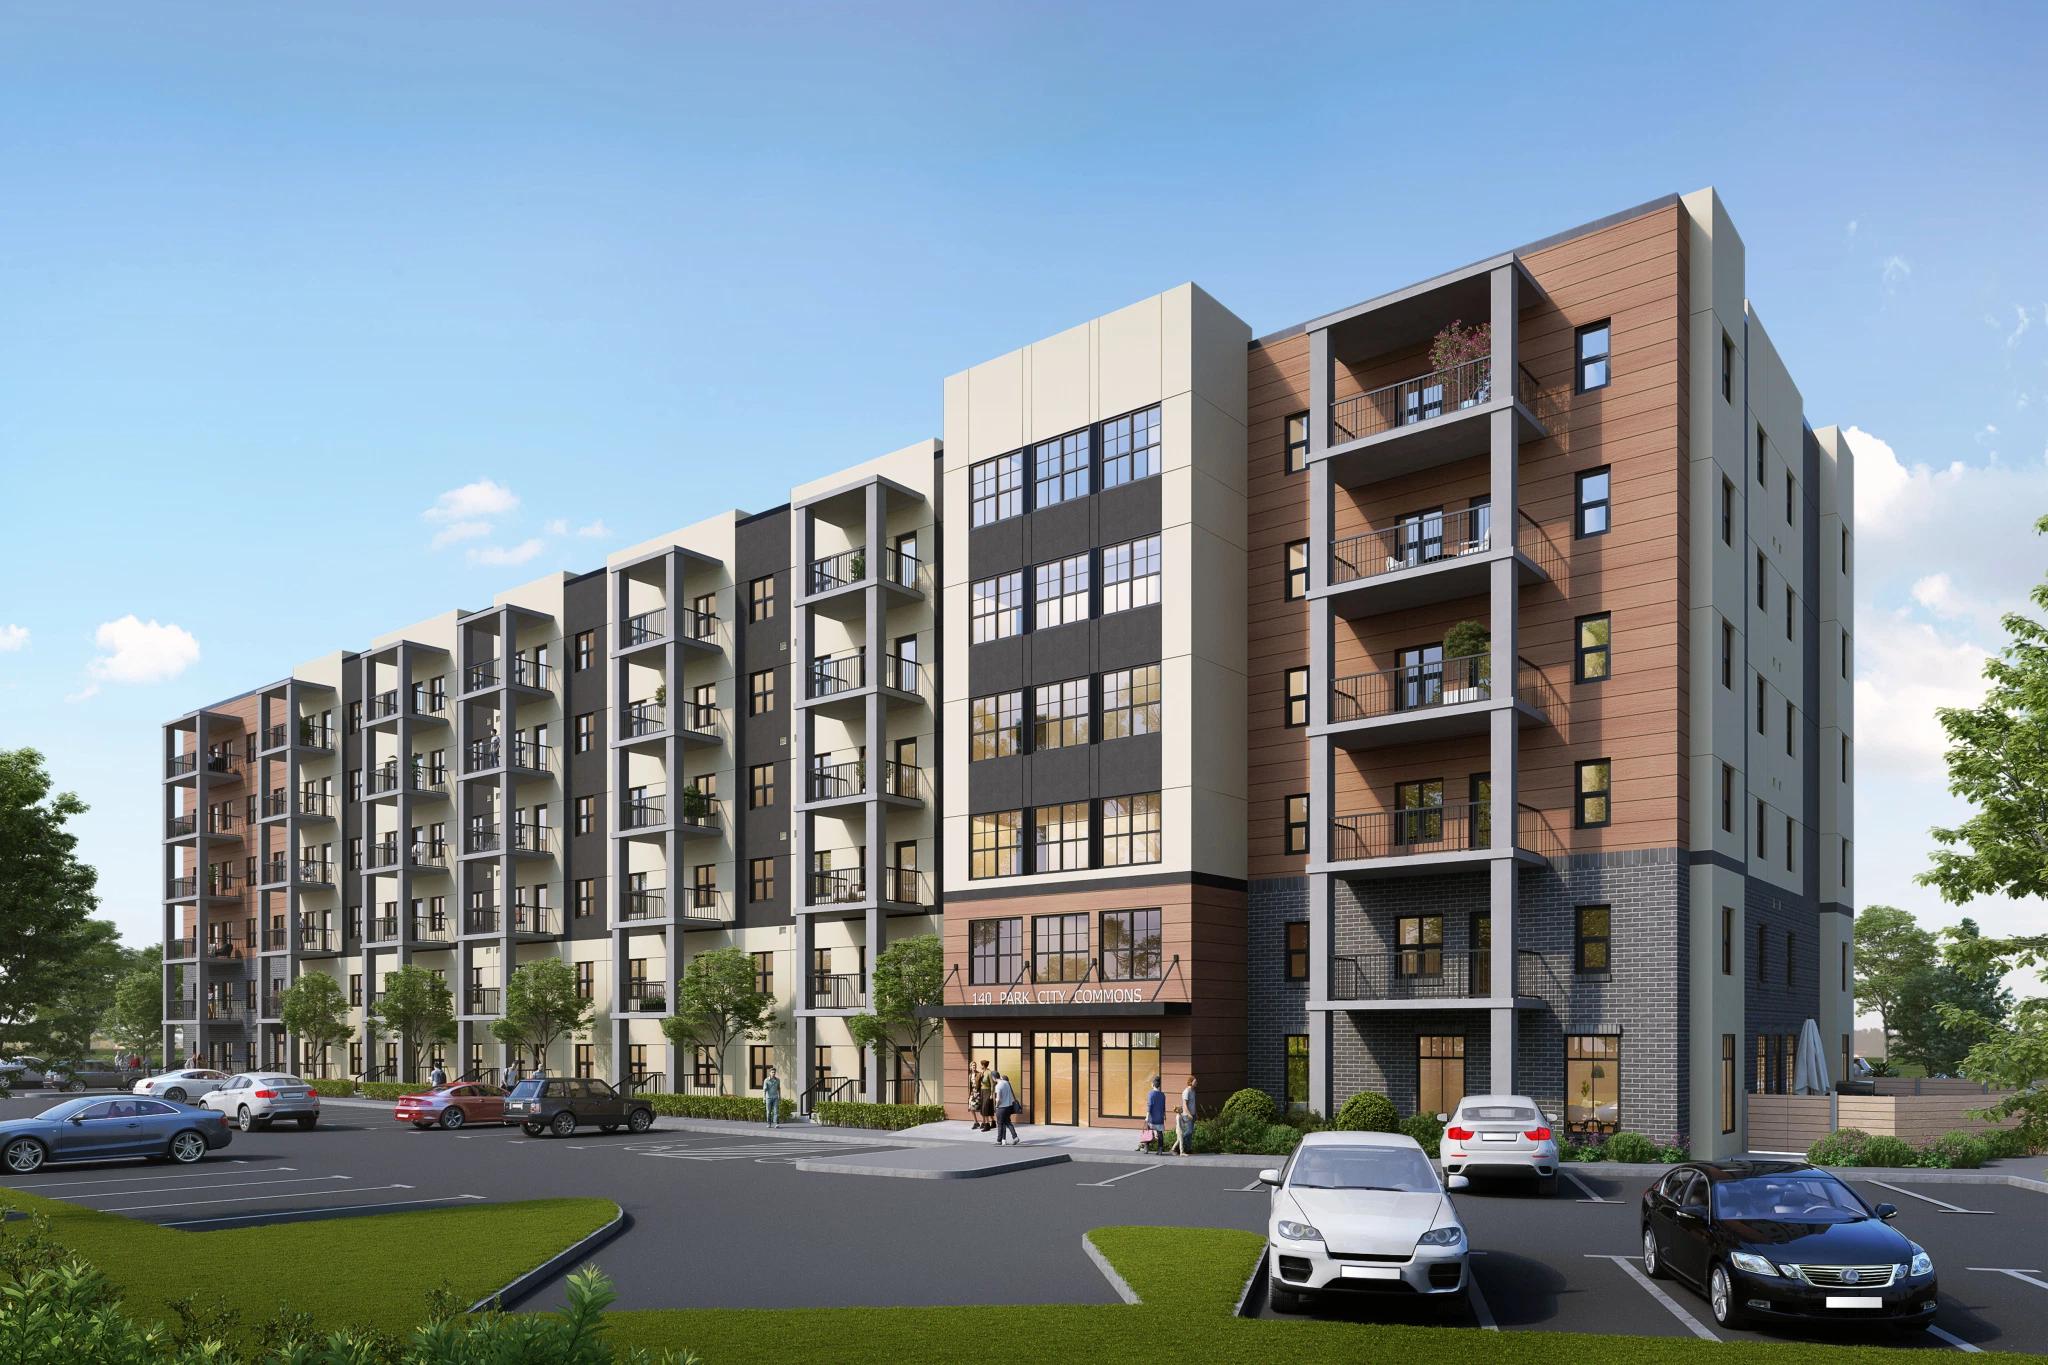 FEDS PUT $22 MILLION TOWARD RENTAL HOUSING IN WINNIPEG